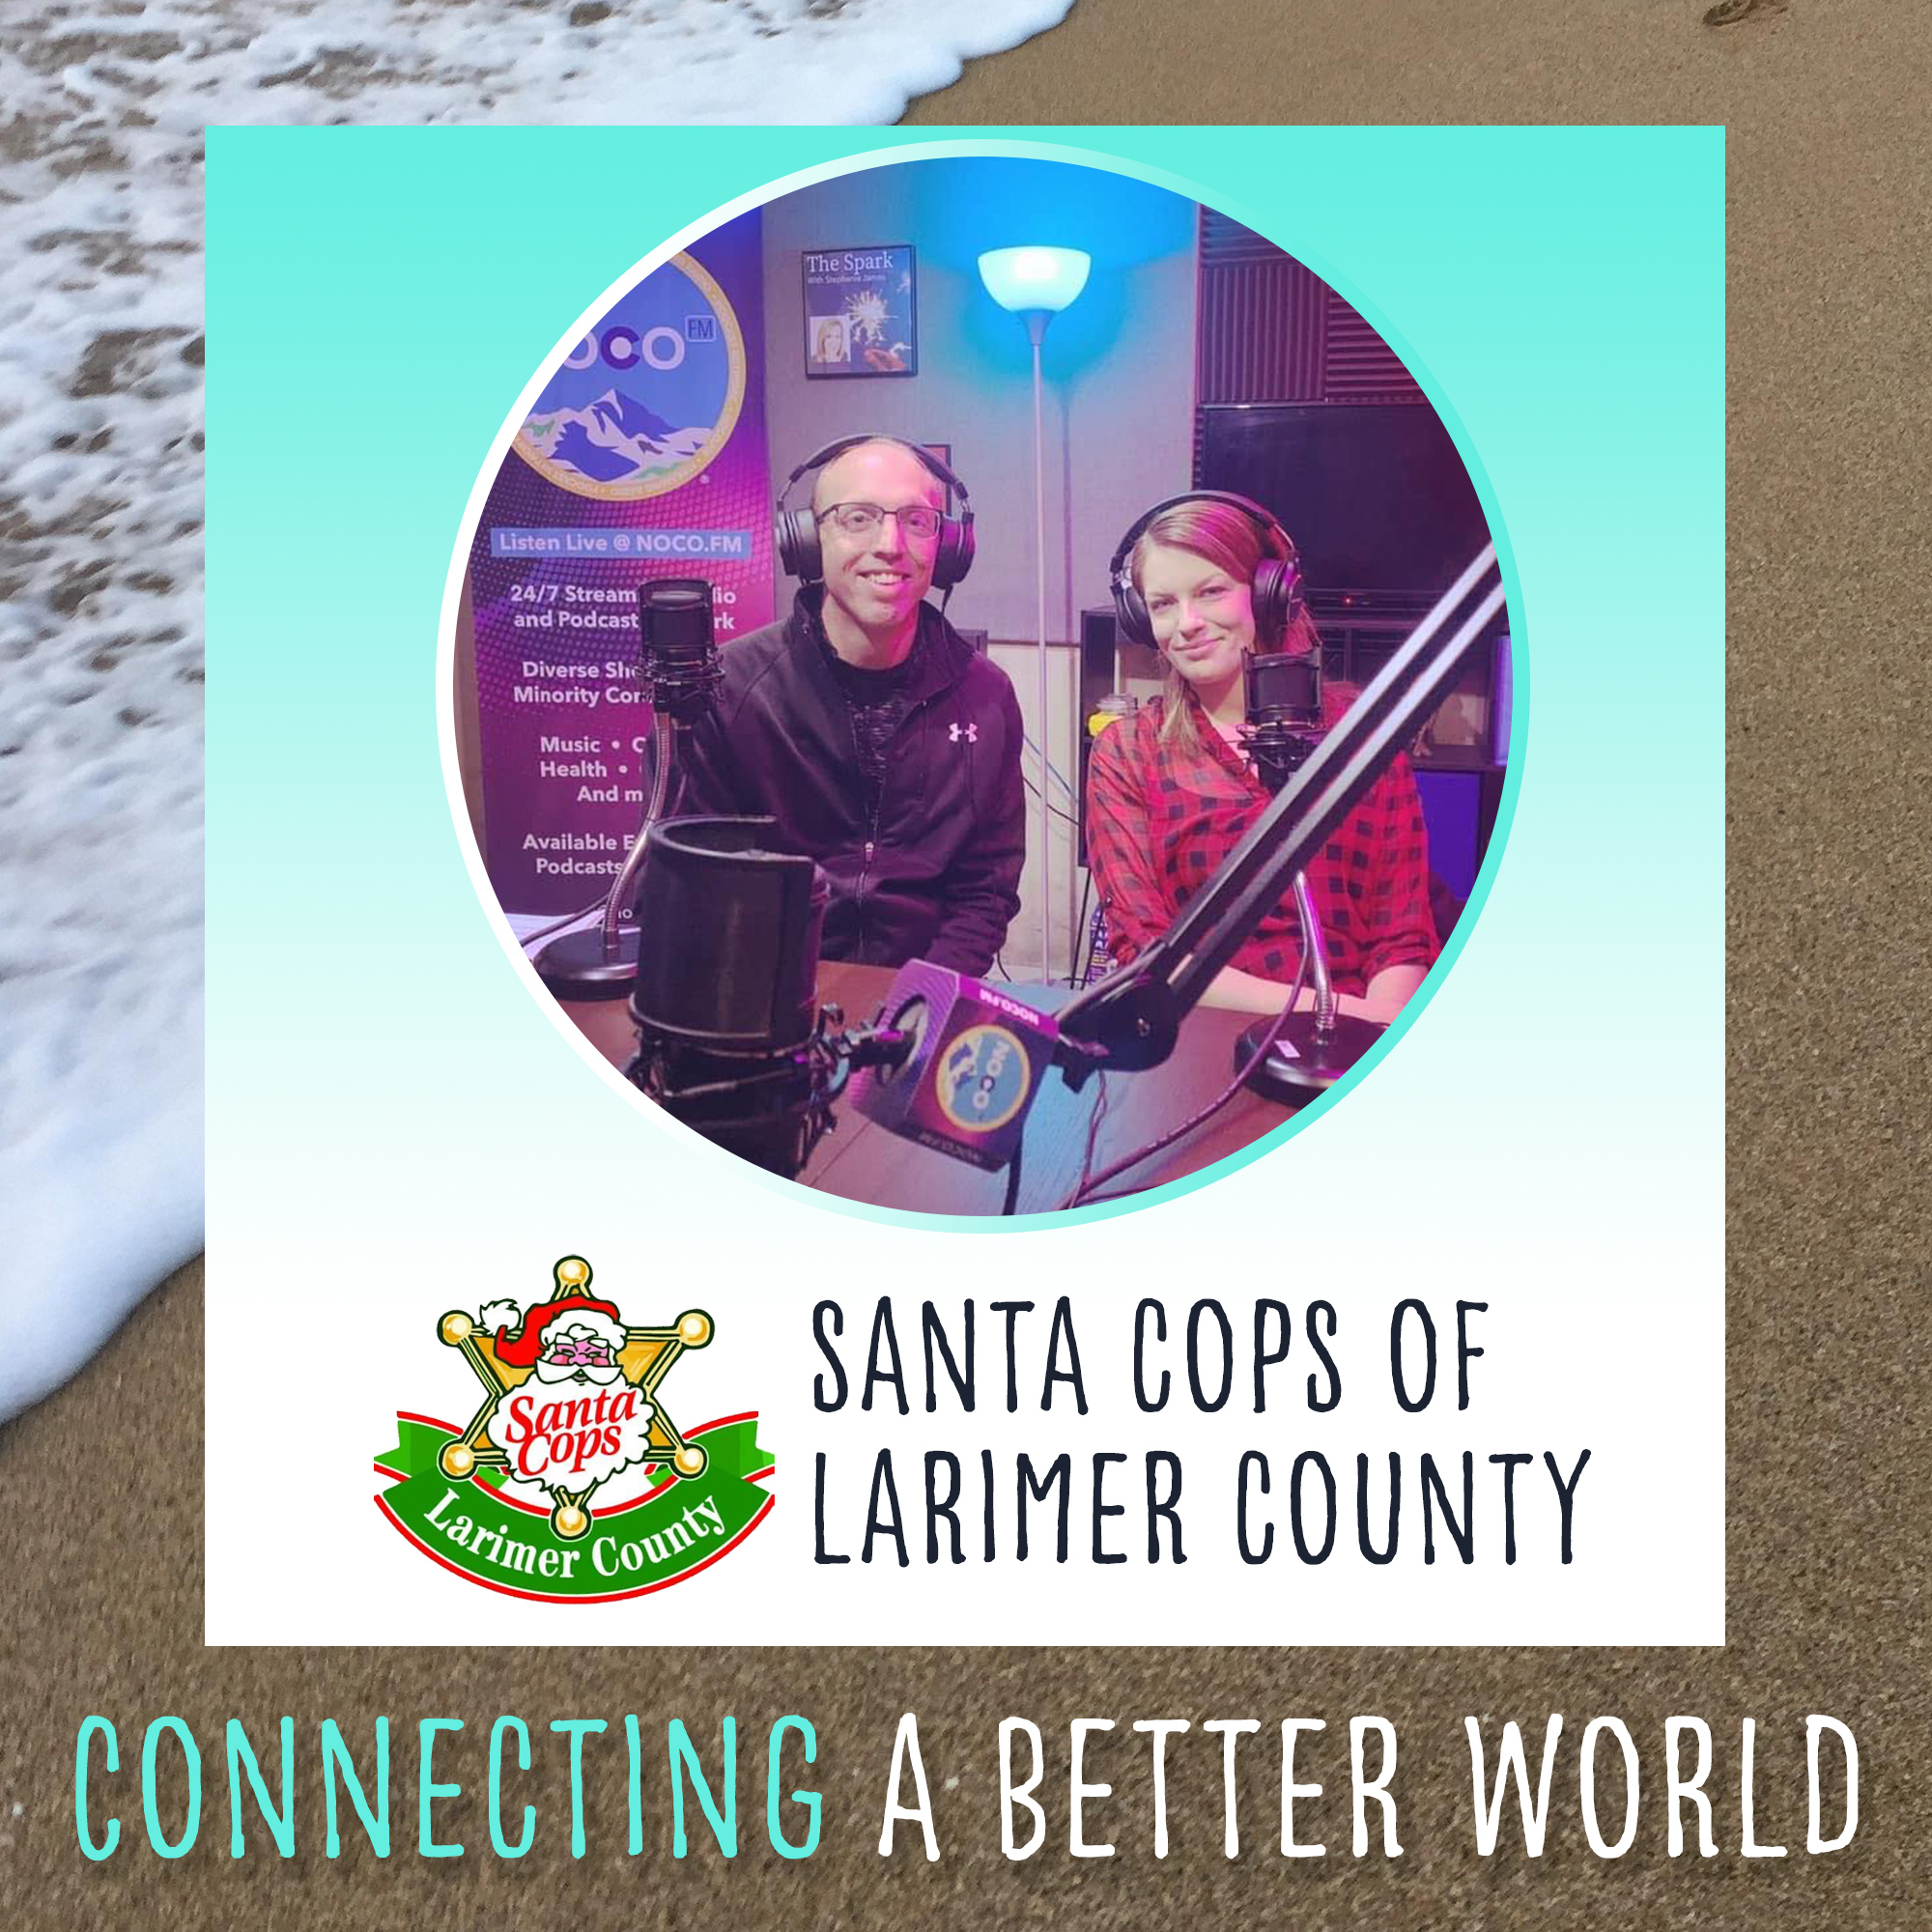 Santa Cops of Larimer County